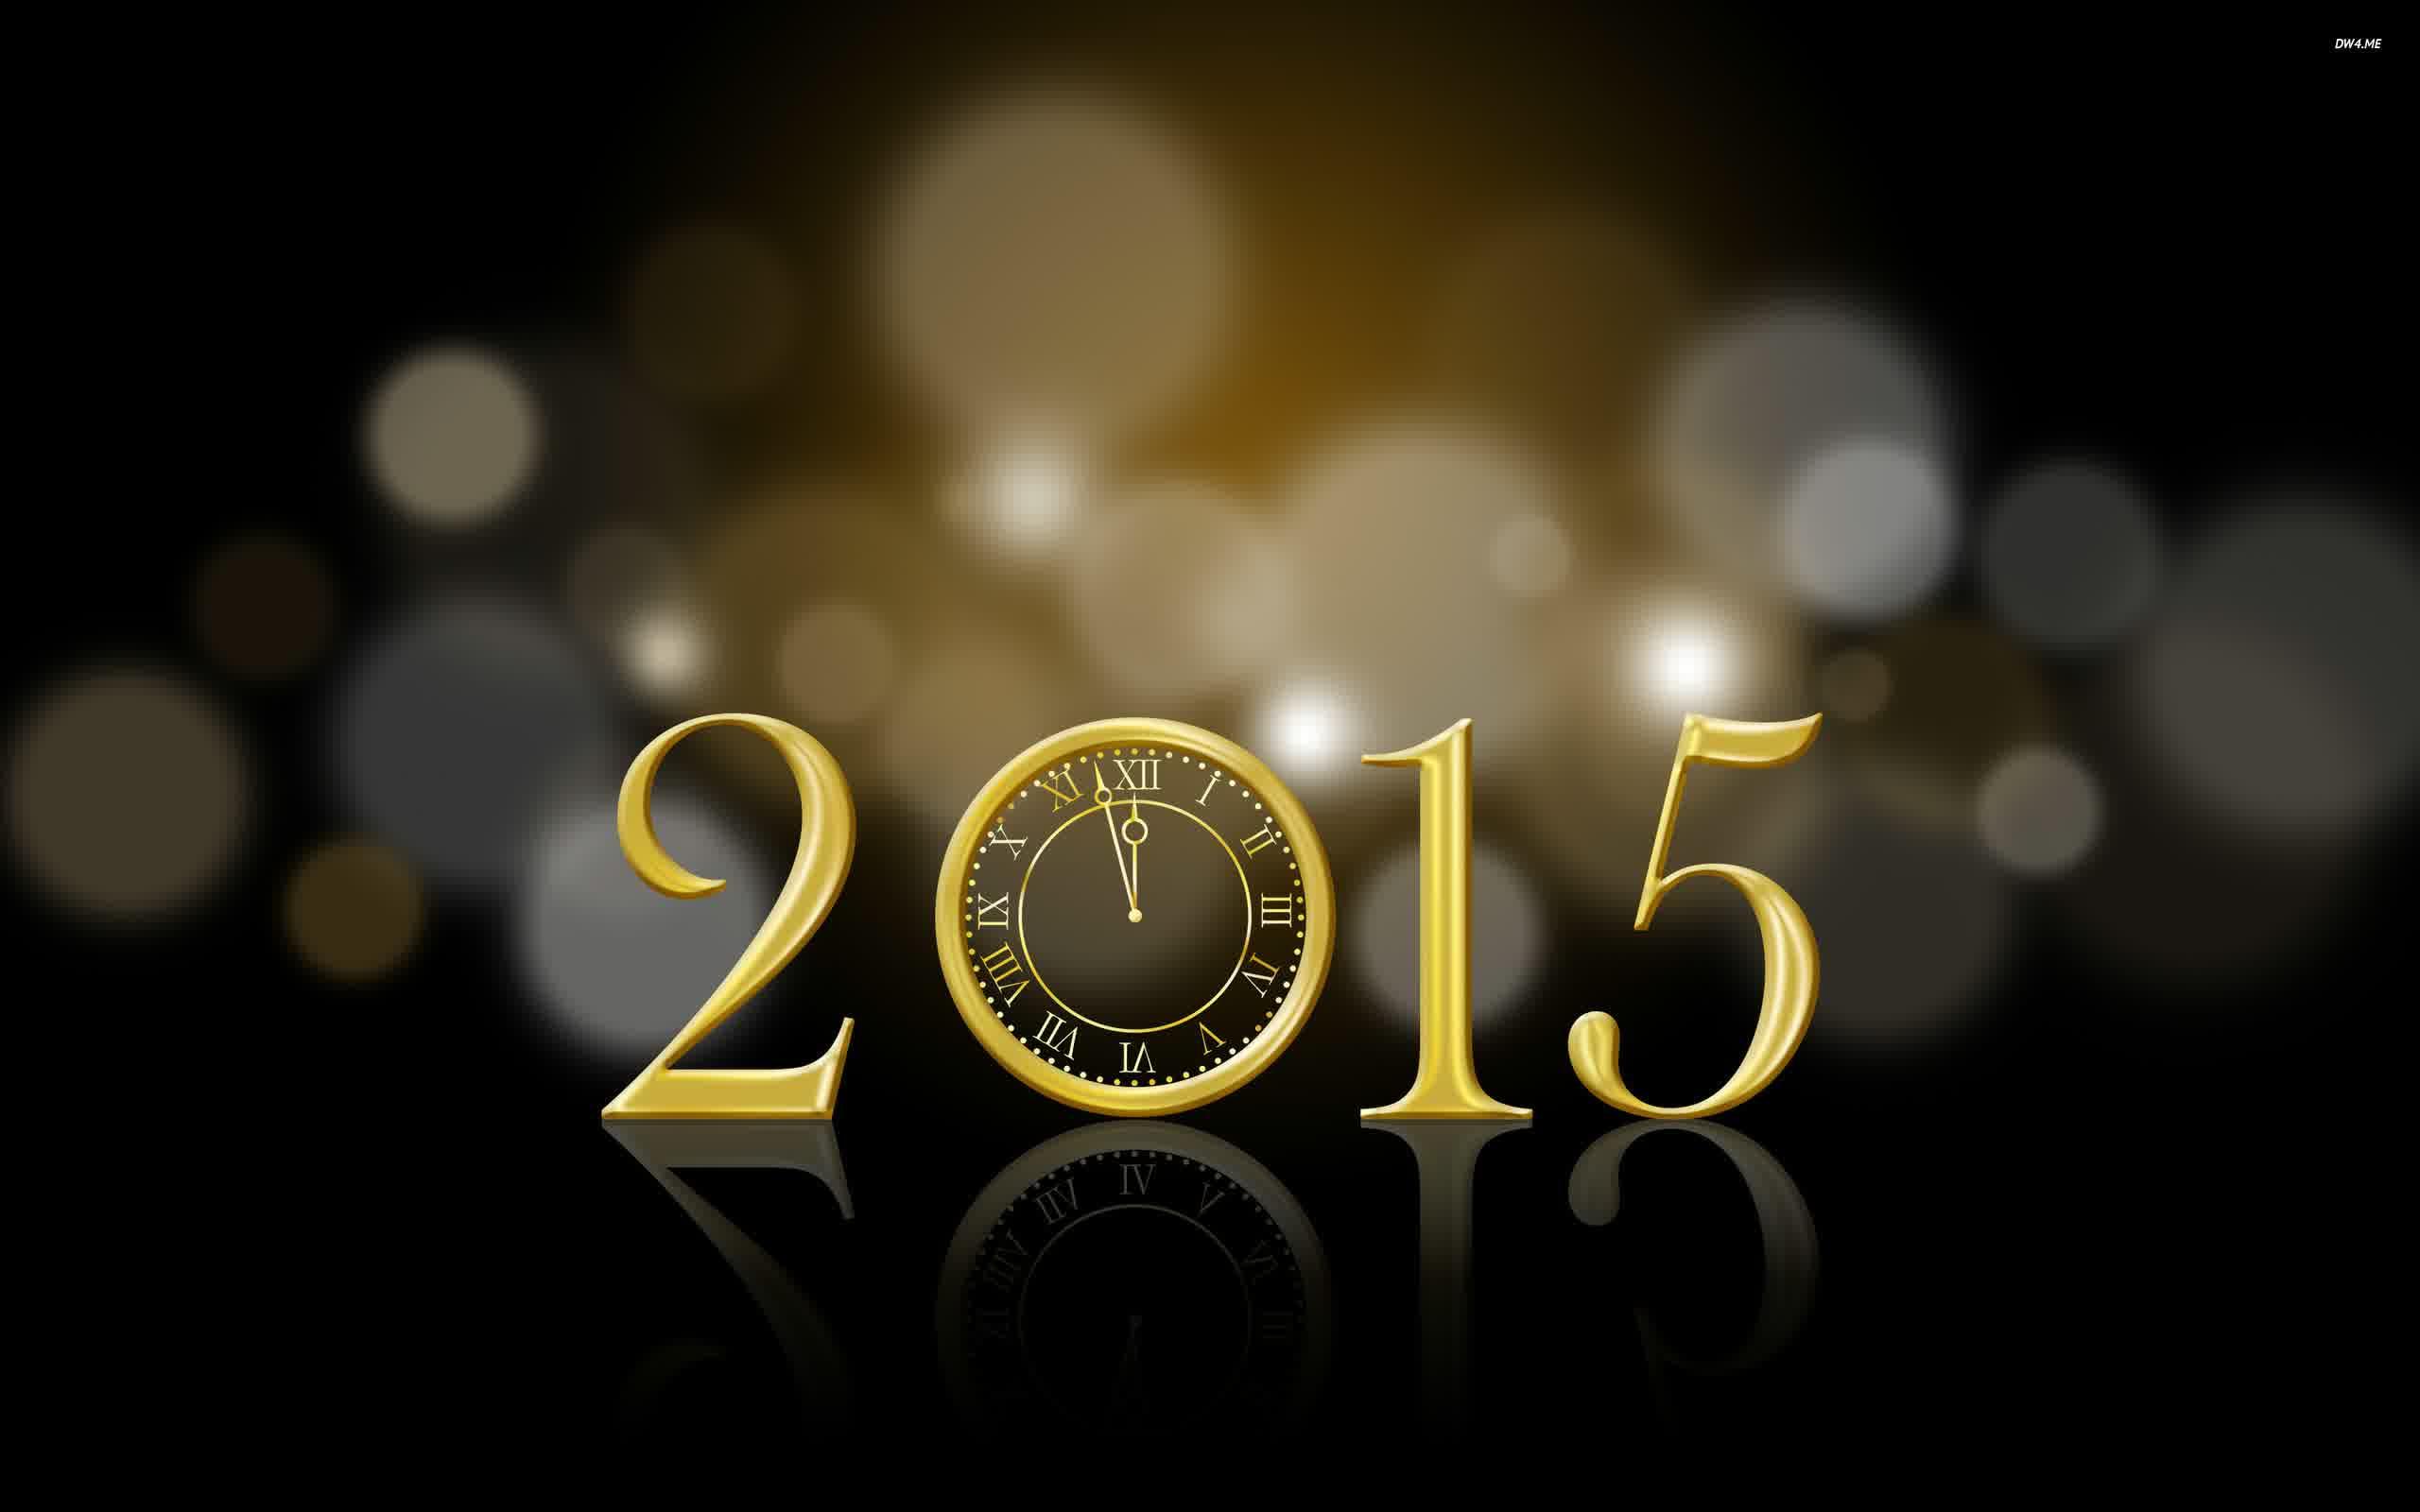 Happy New Year 2015 HD Wallpaper loopelecom 2560x1600